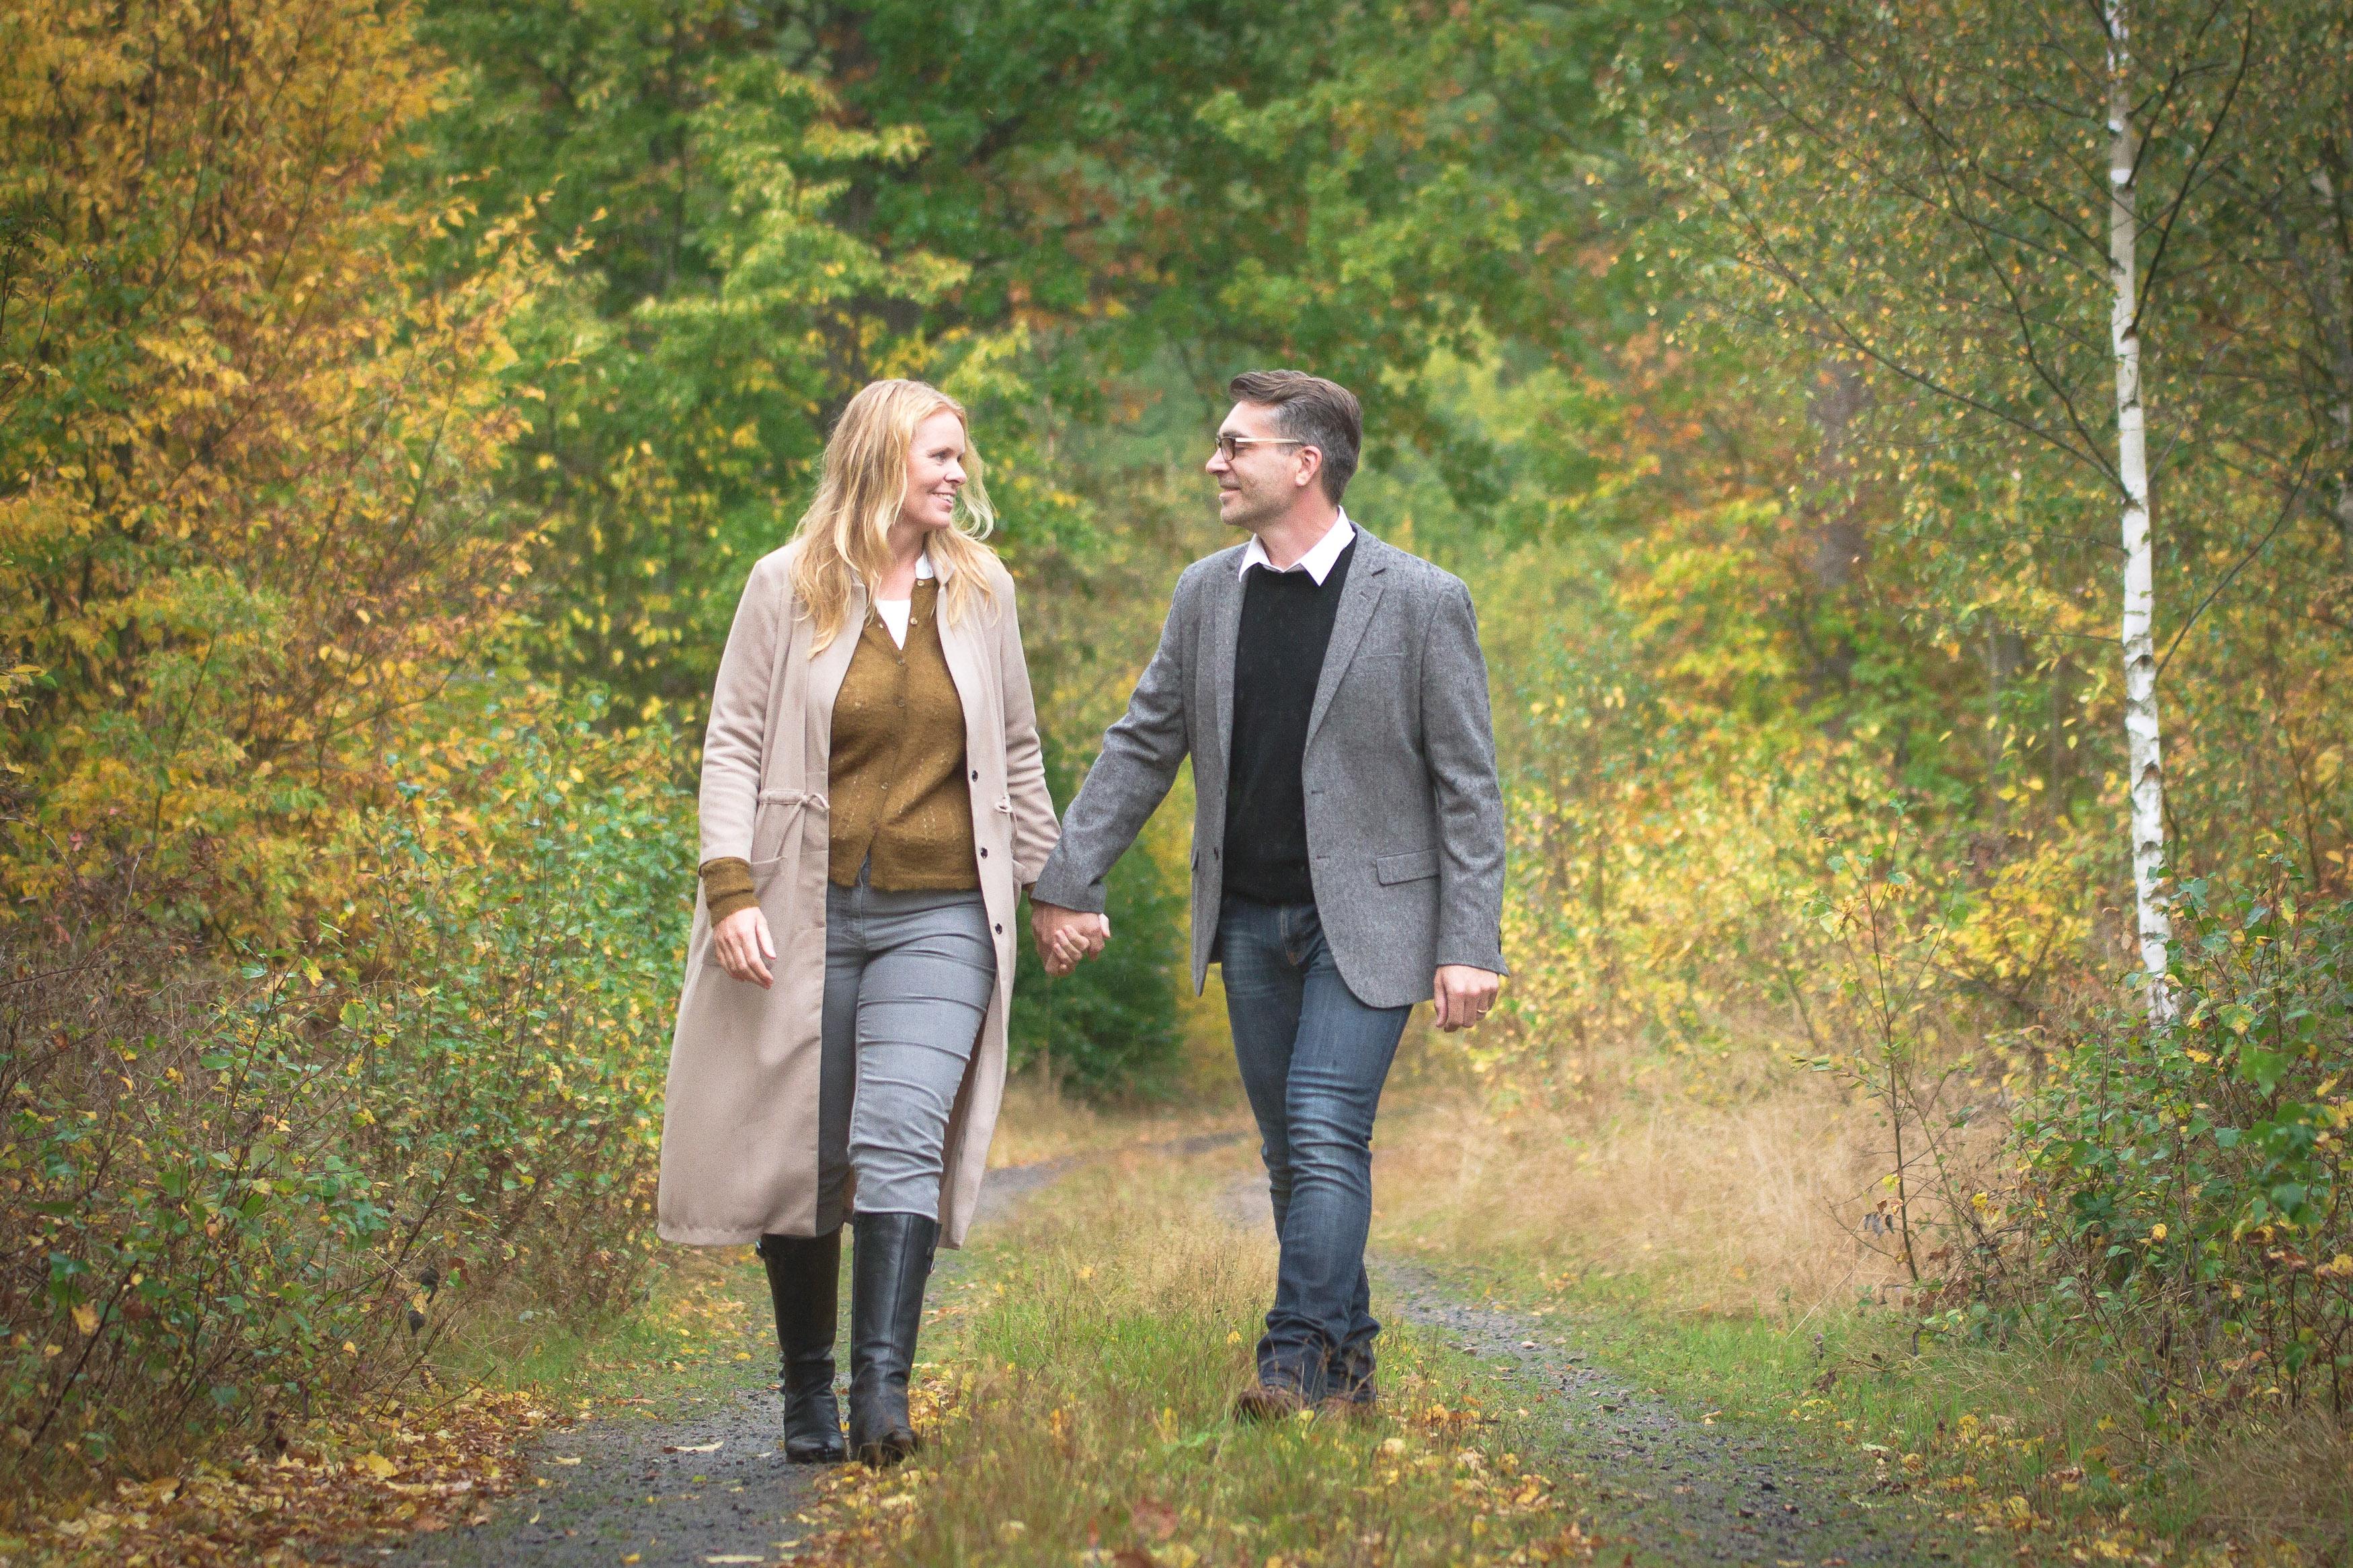 Annatarfoto parfotografering höst Bräkne-Hoby Ronneby